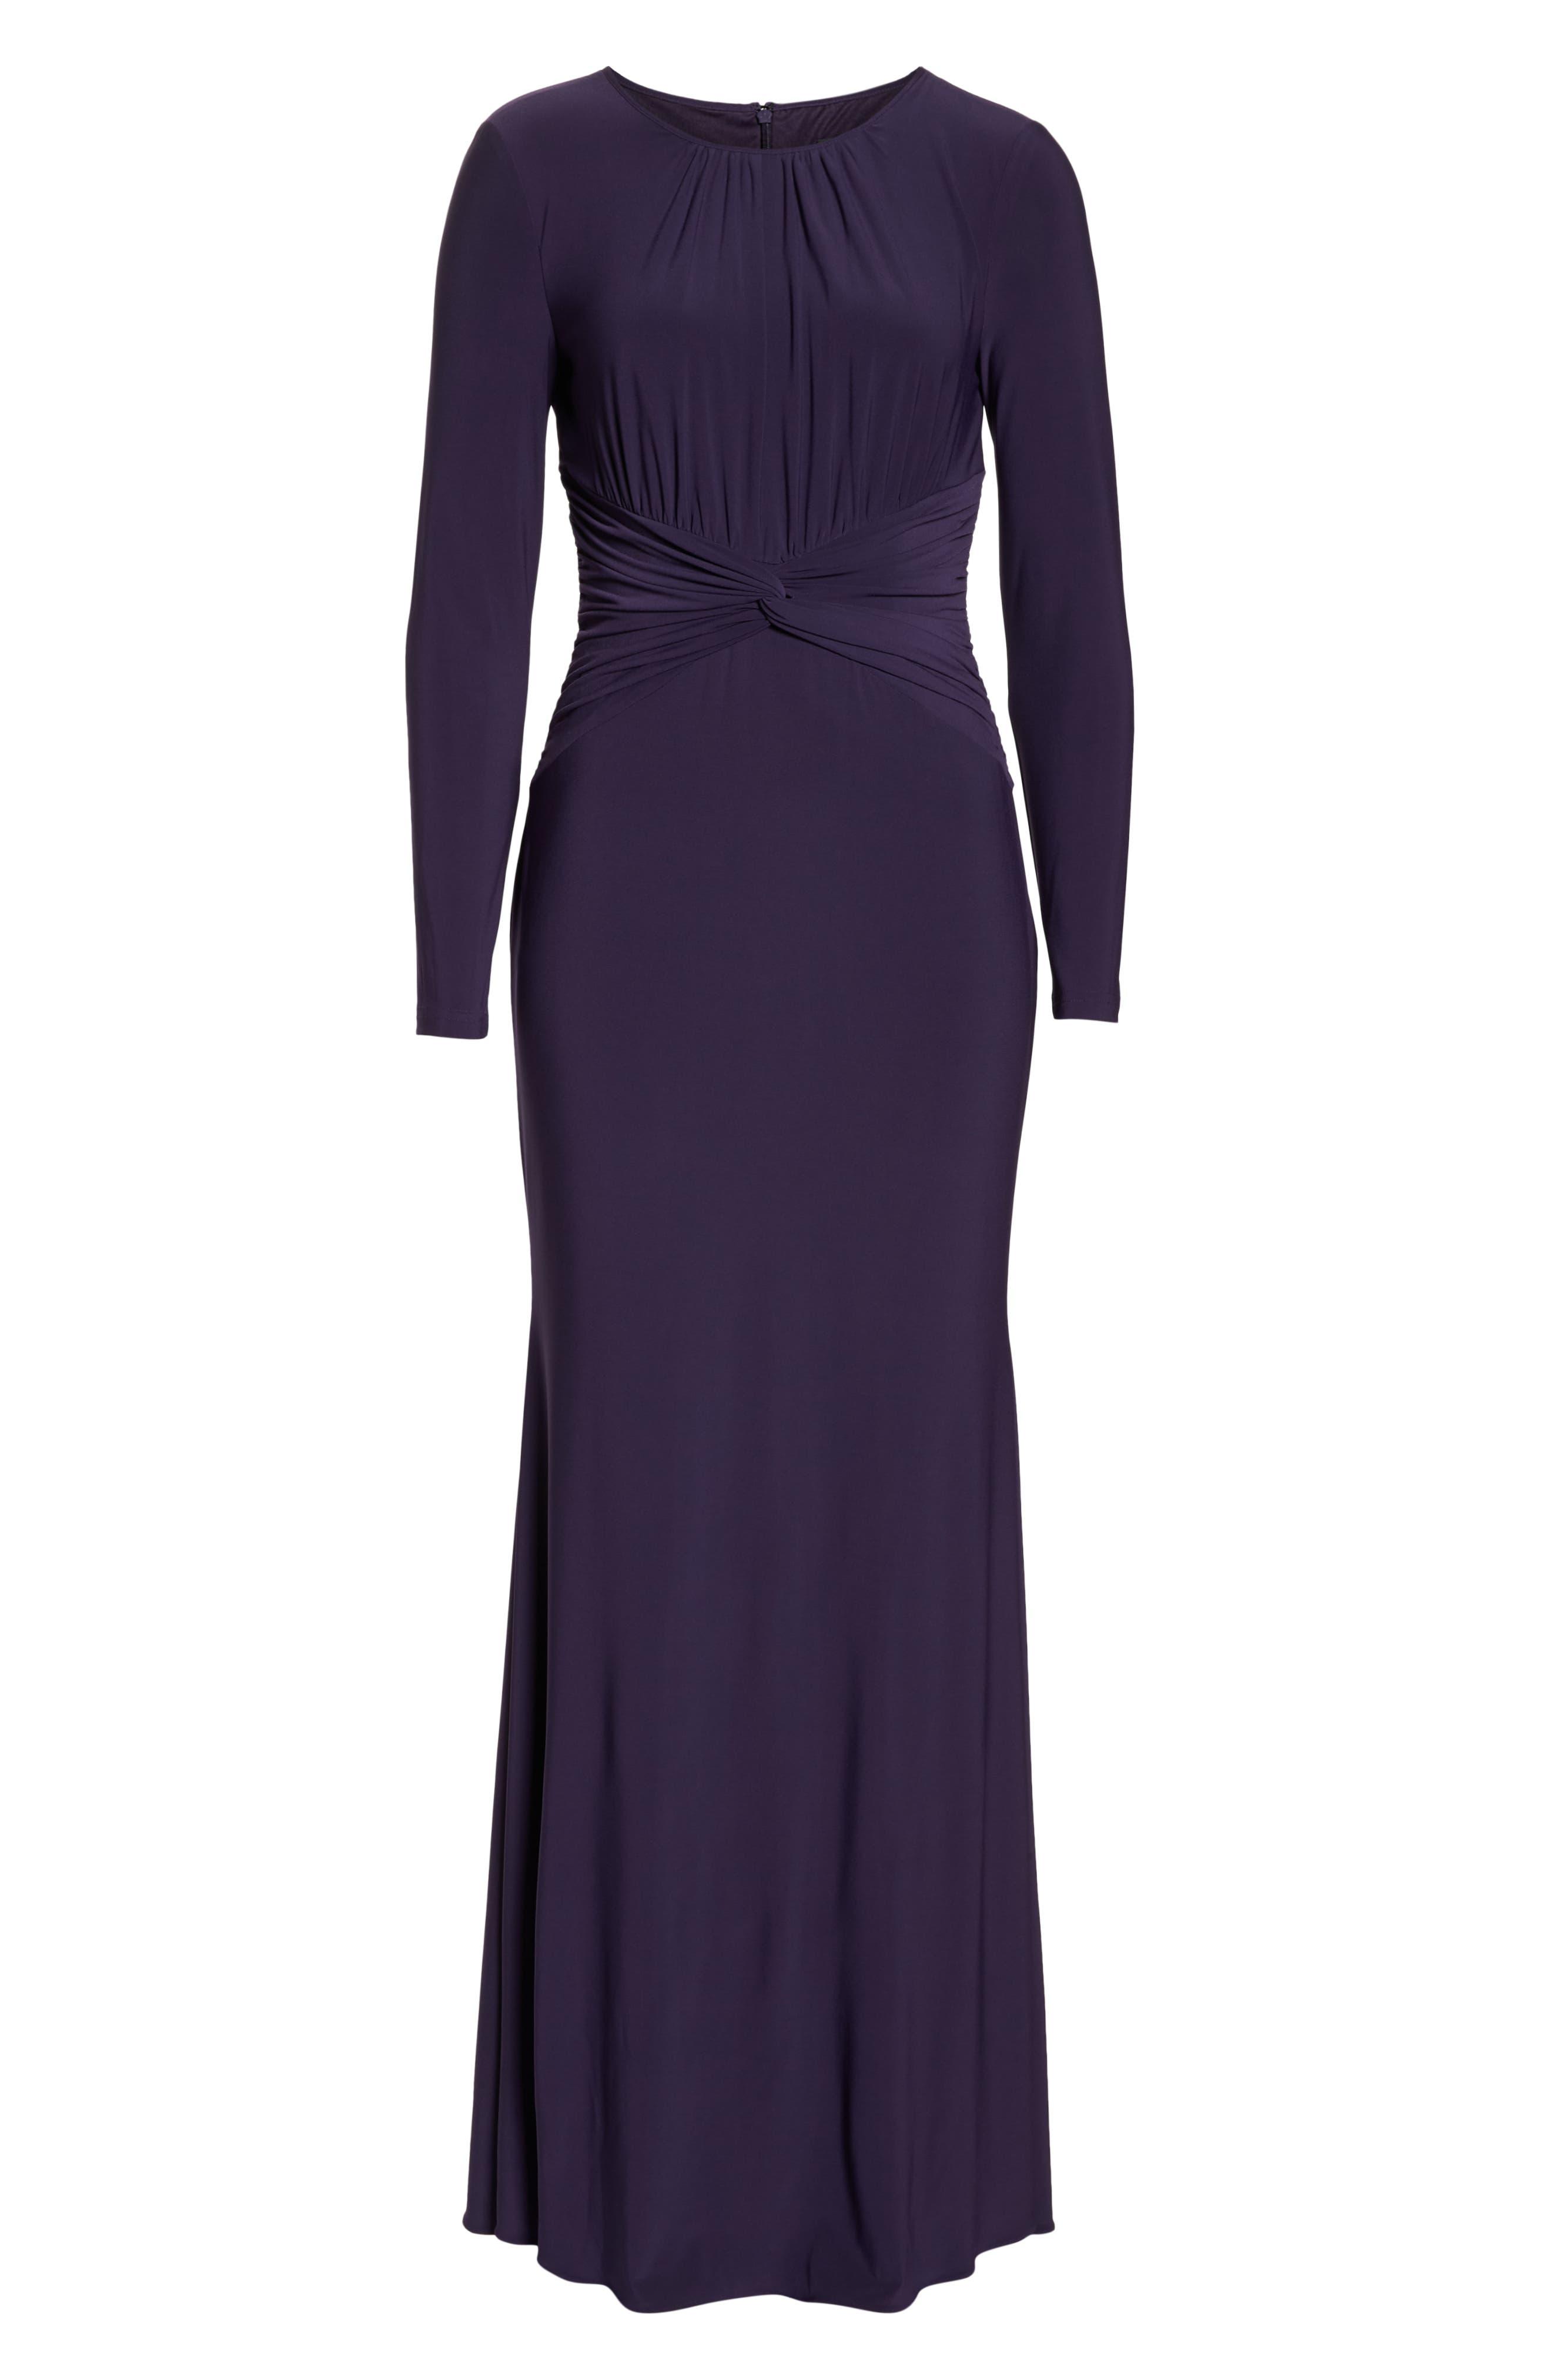 ADRIANNA PAPELL,                             Twist Waist Knit Dress,                             Alternate thumbnail 7, color,                             501